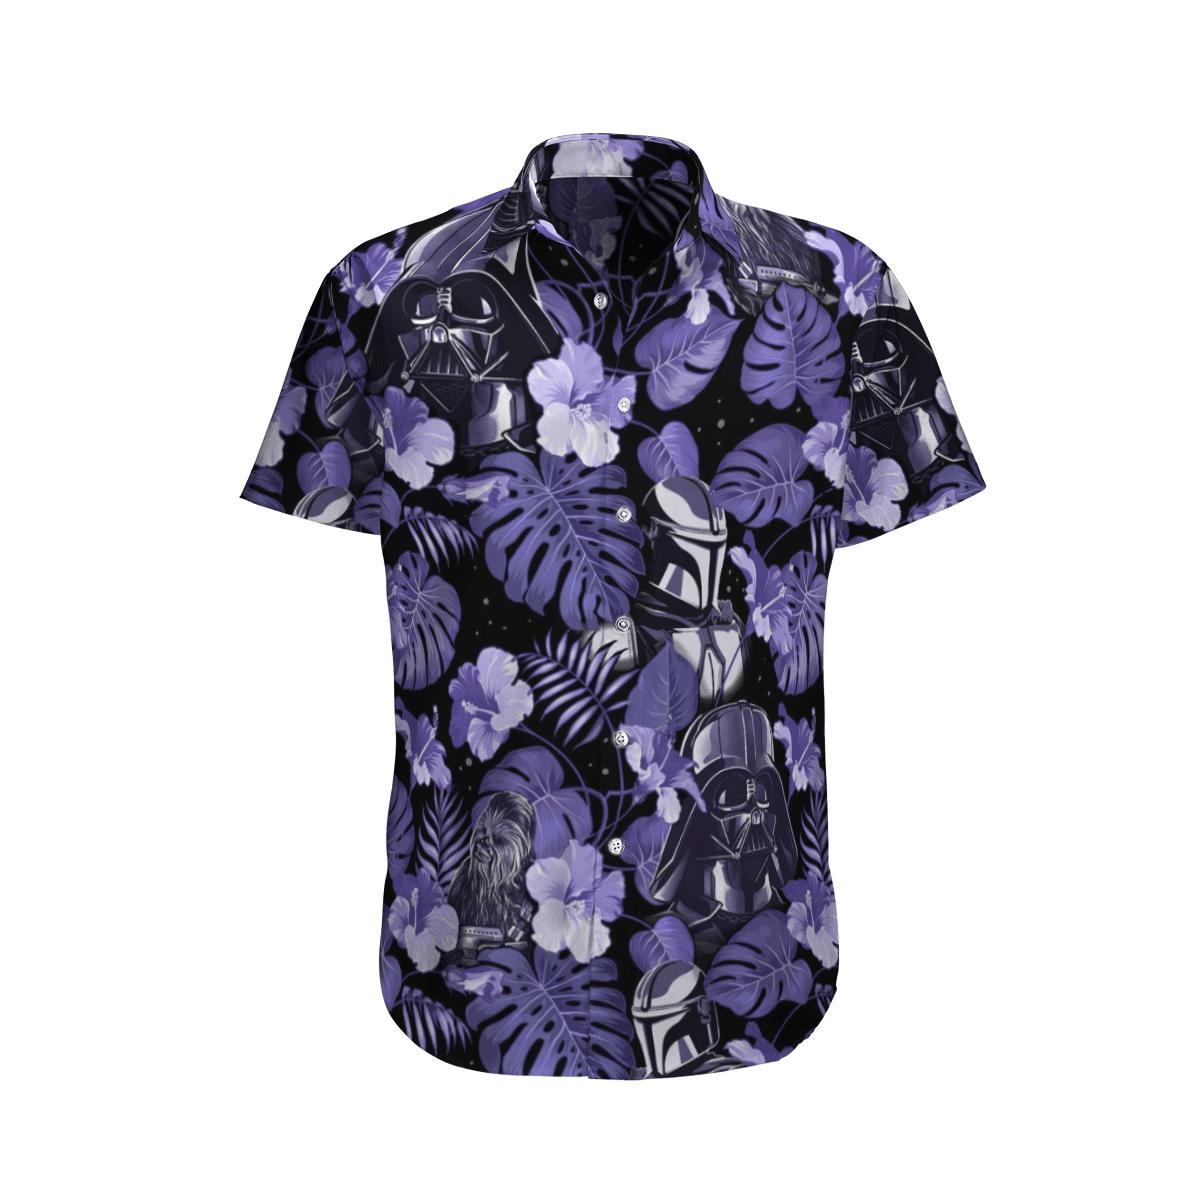 Star wars Vader Floral Purple Hawaiian Shirt